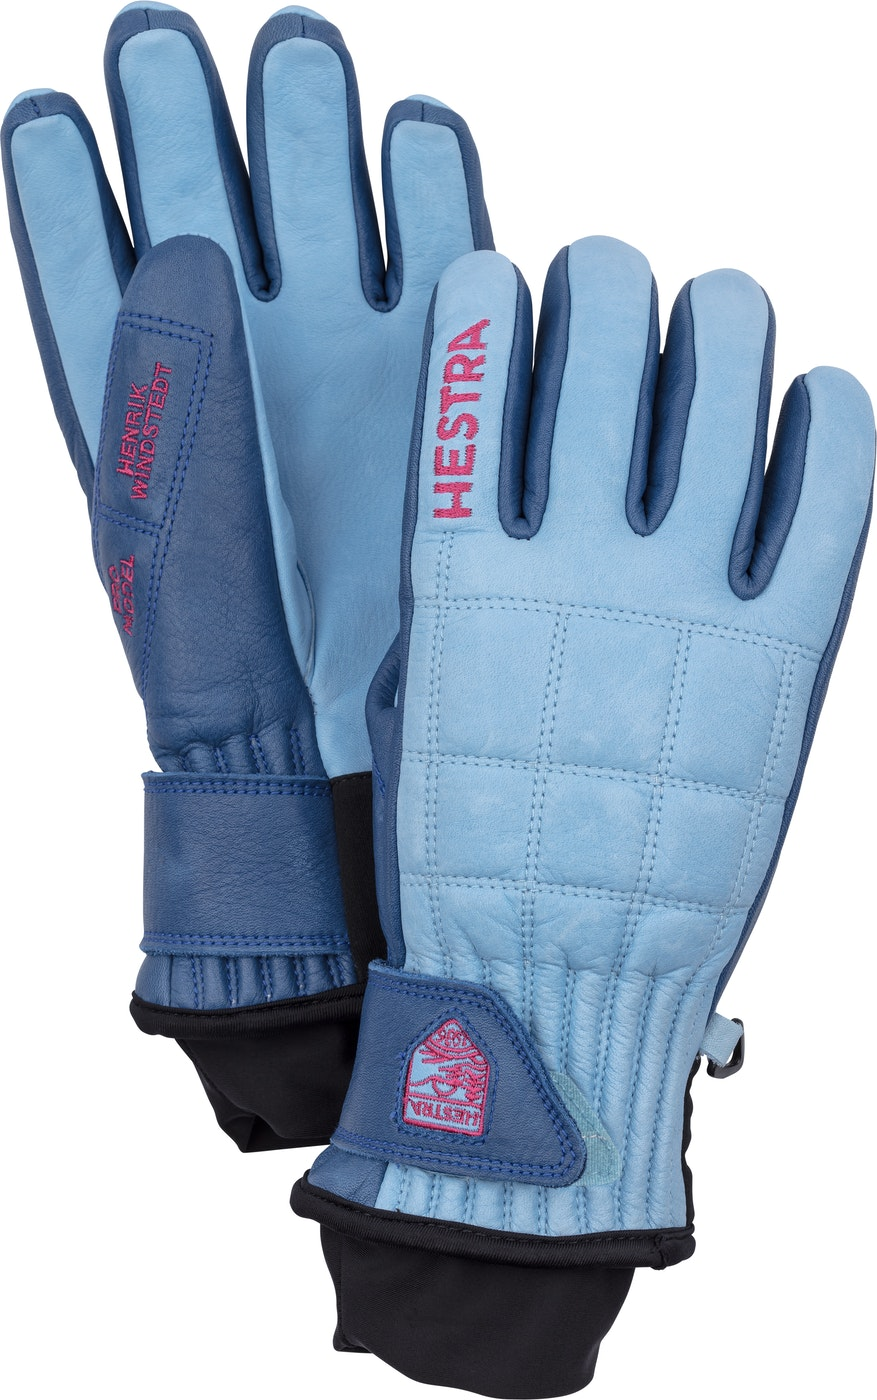 Product image for 30820 Henrik Leather Pro Model